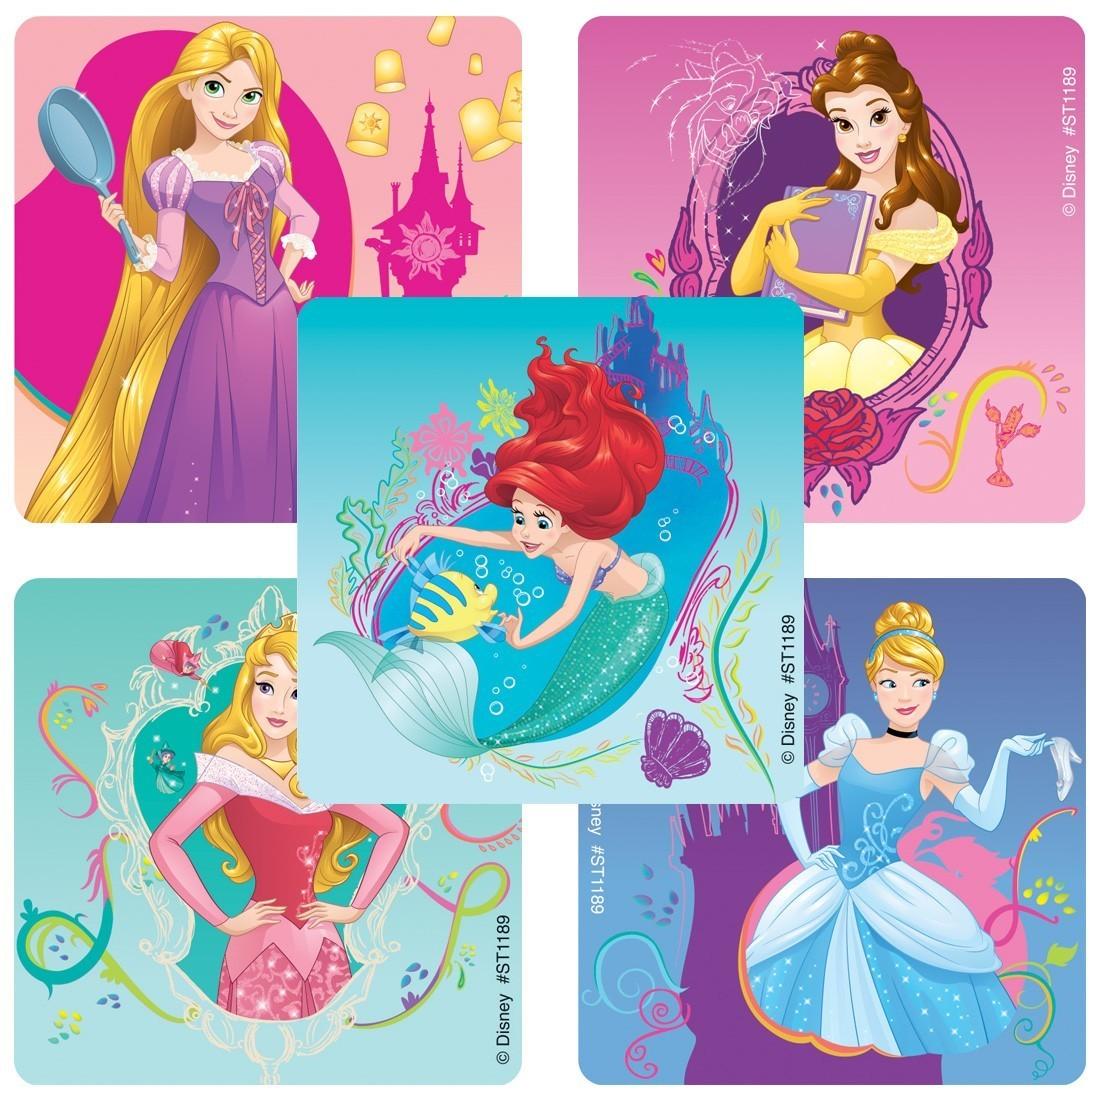 Disney Princess Enchanted Stickers [image]